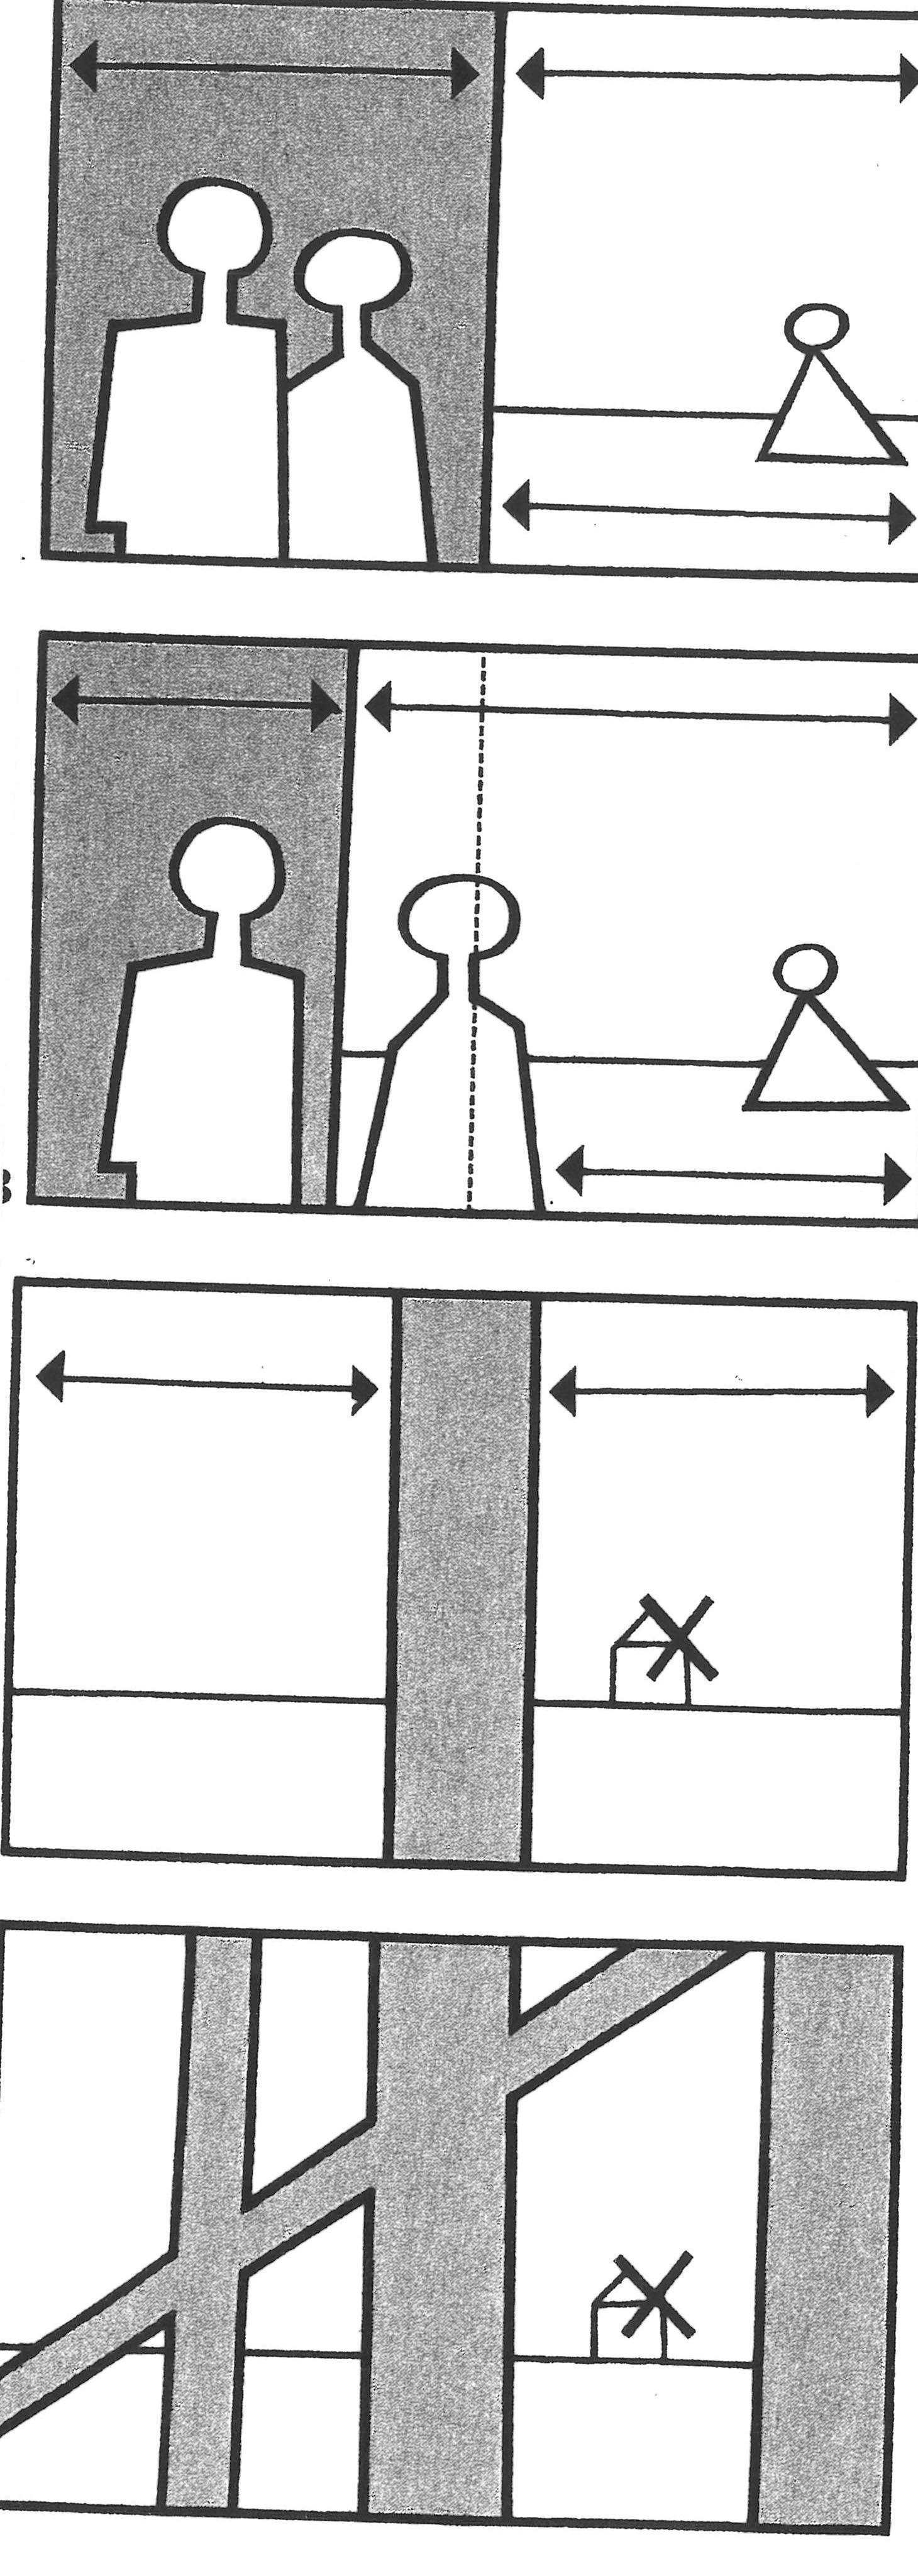 Le Partage Vertical DUne Image  Composition  Theorie